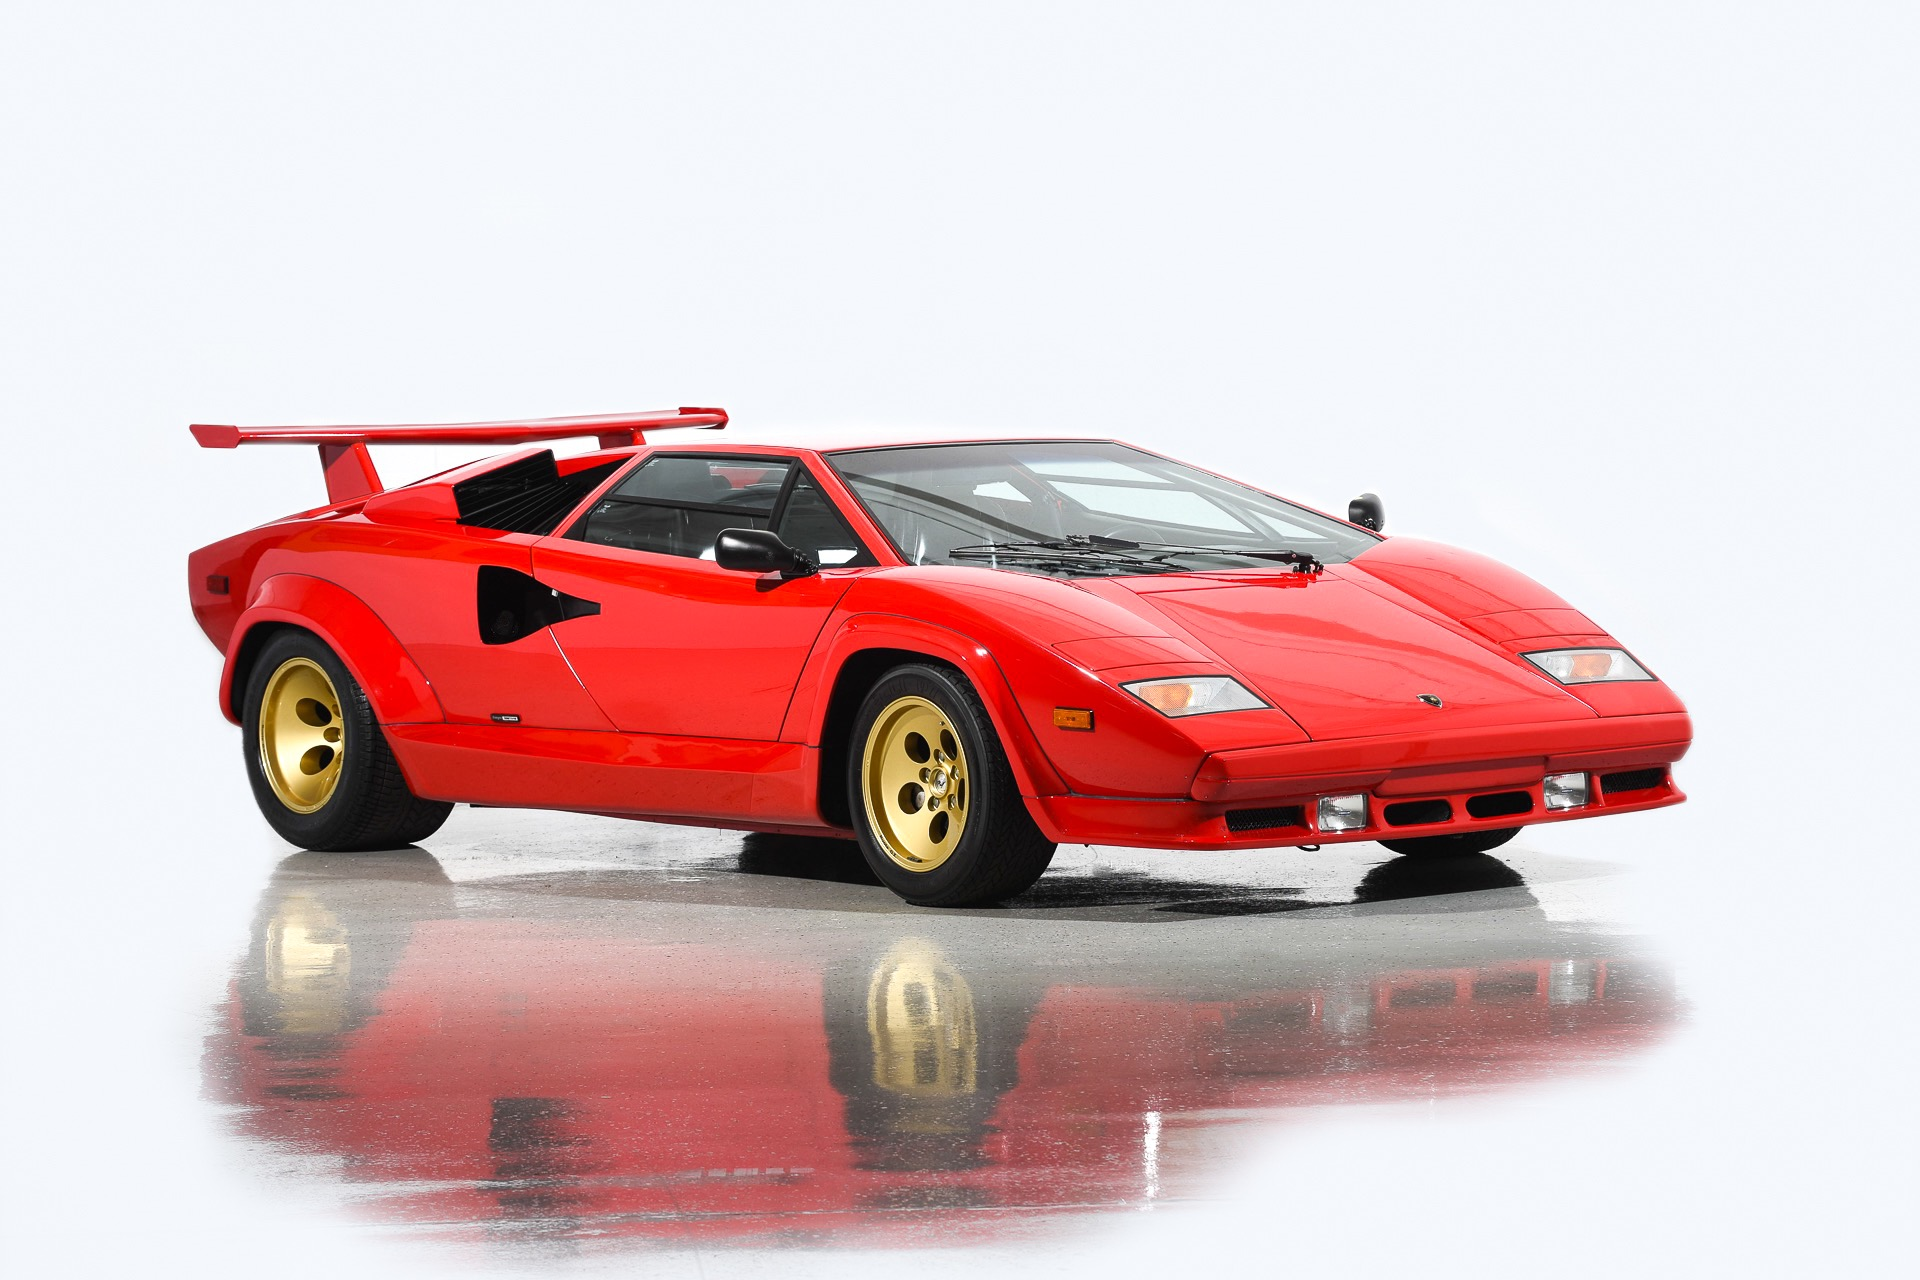 Used 1987 Lamborghini Countach 5000 Qv For Sale Special Pricing